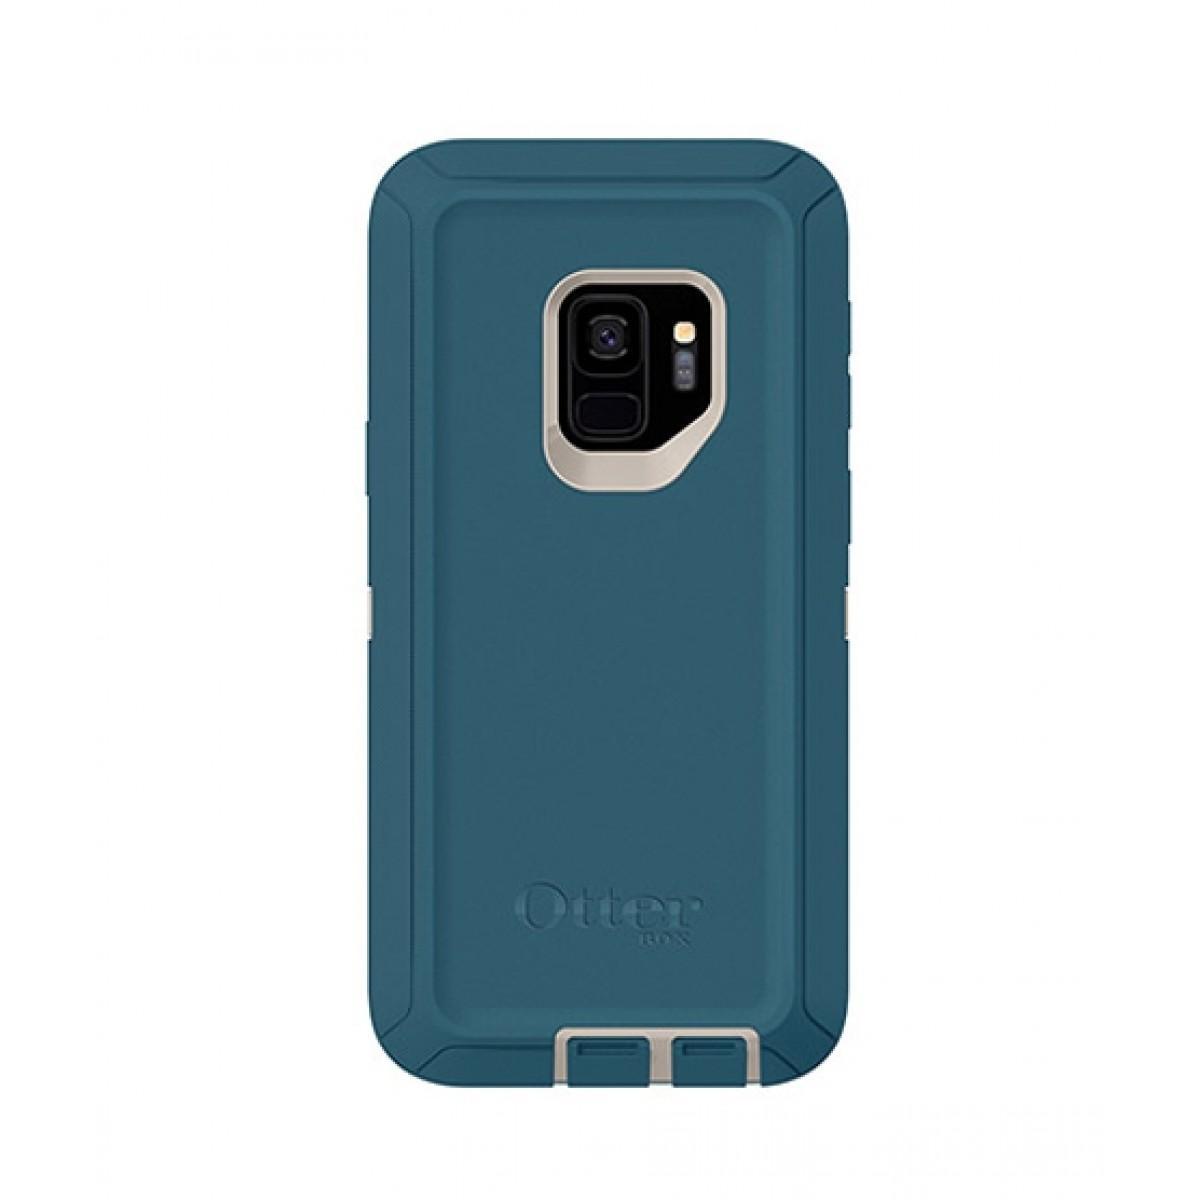 half off 36ecf 54d7c OtterBox Defender Series Screenless Big Sur Blue Case For Galaxy S9